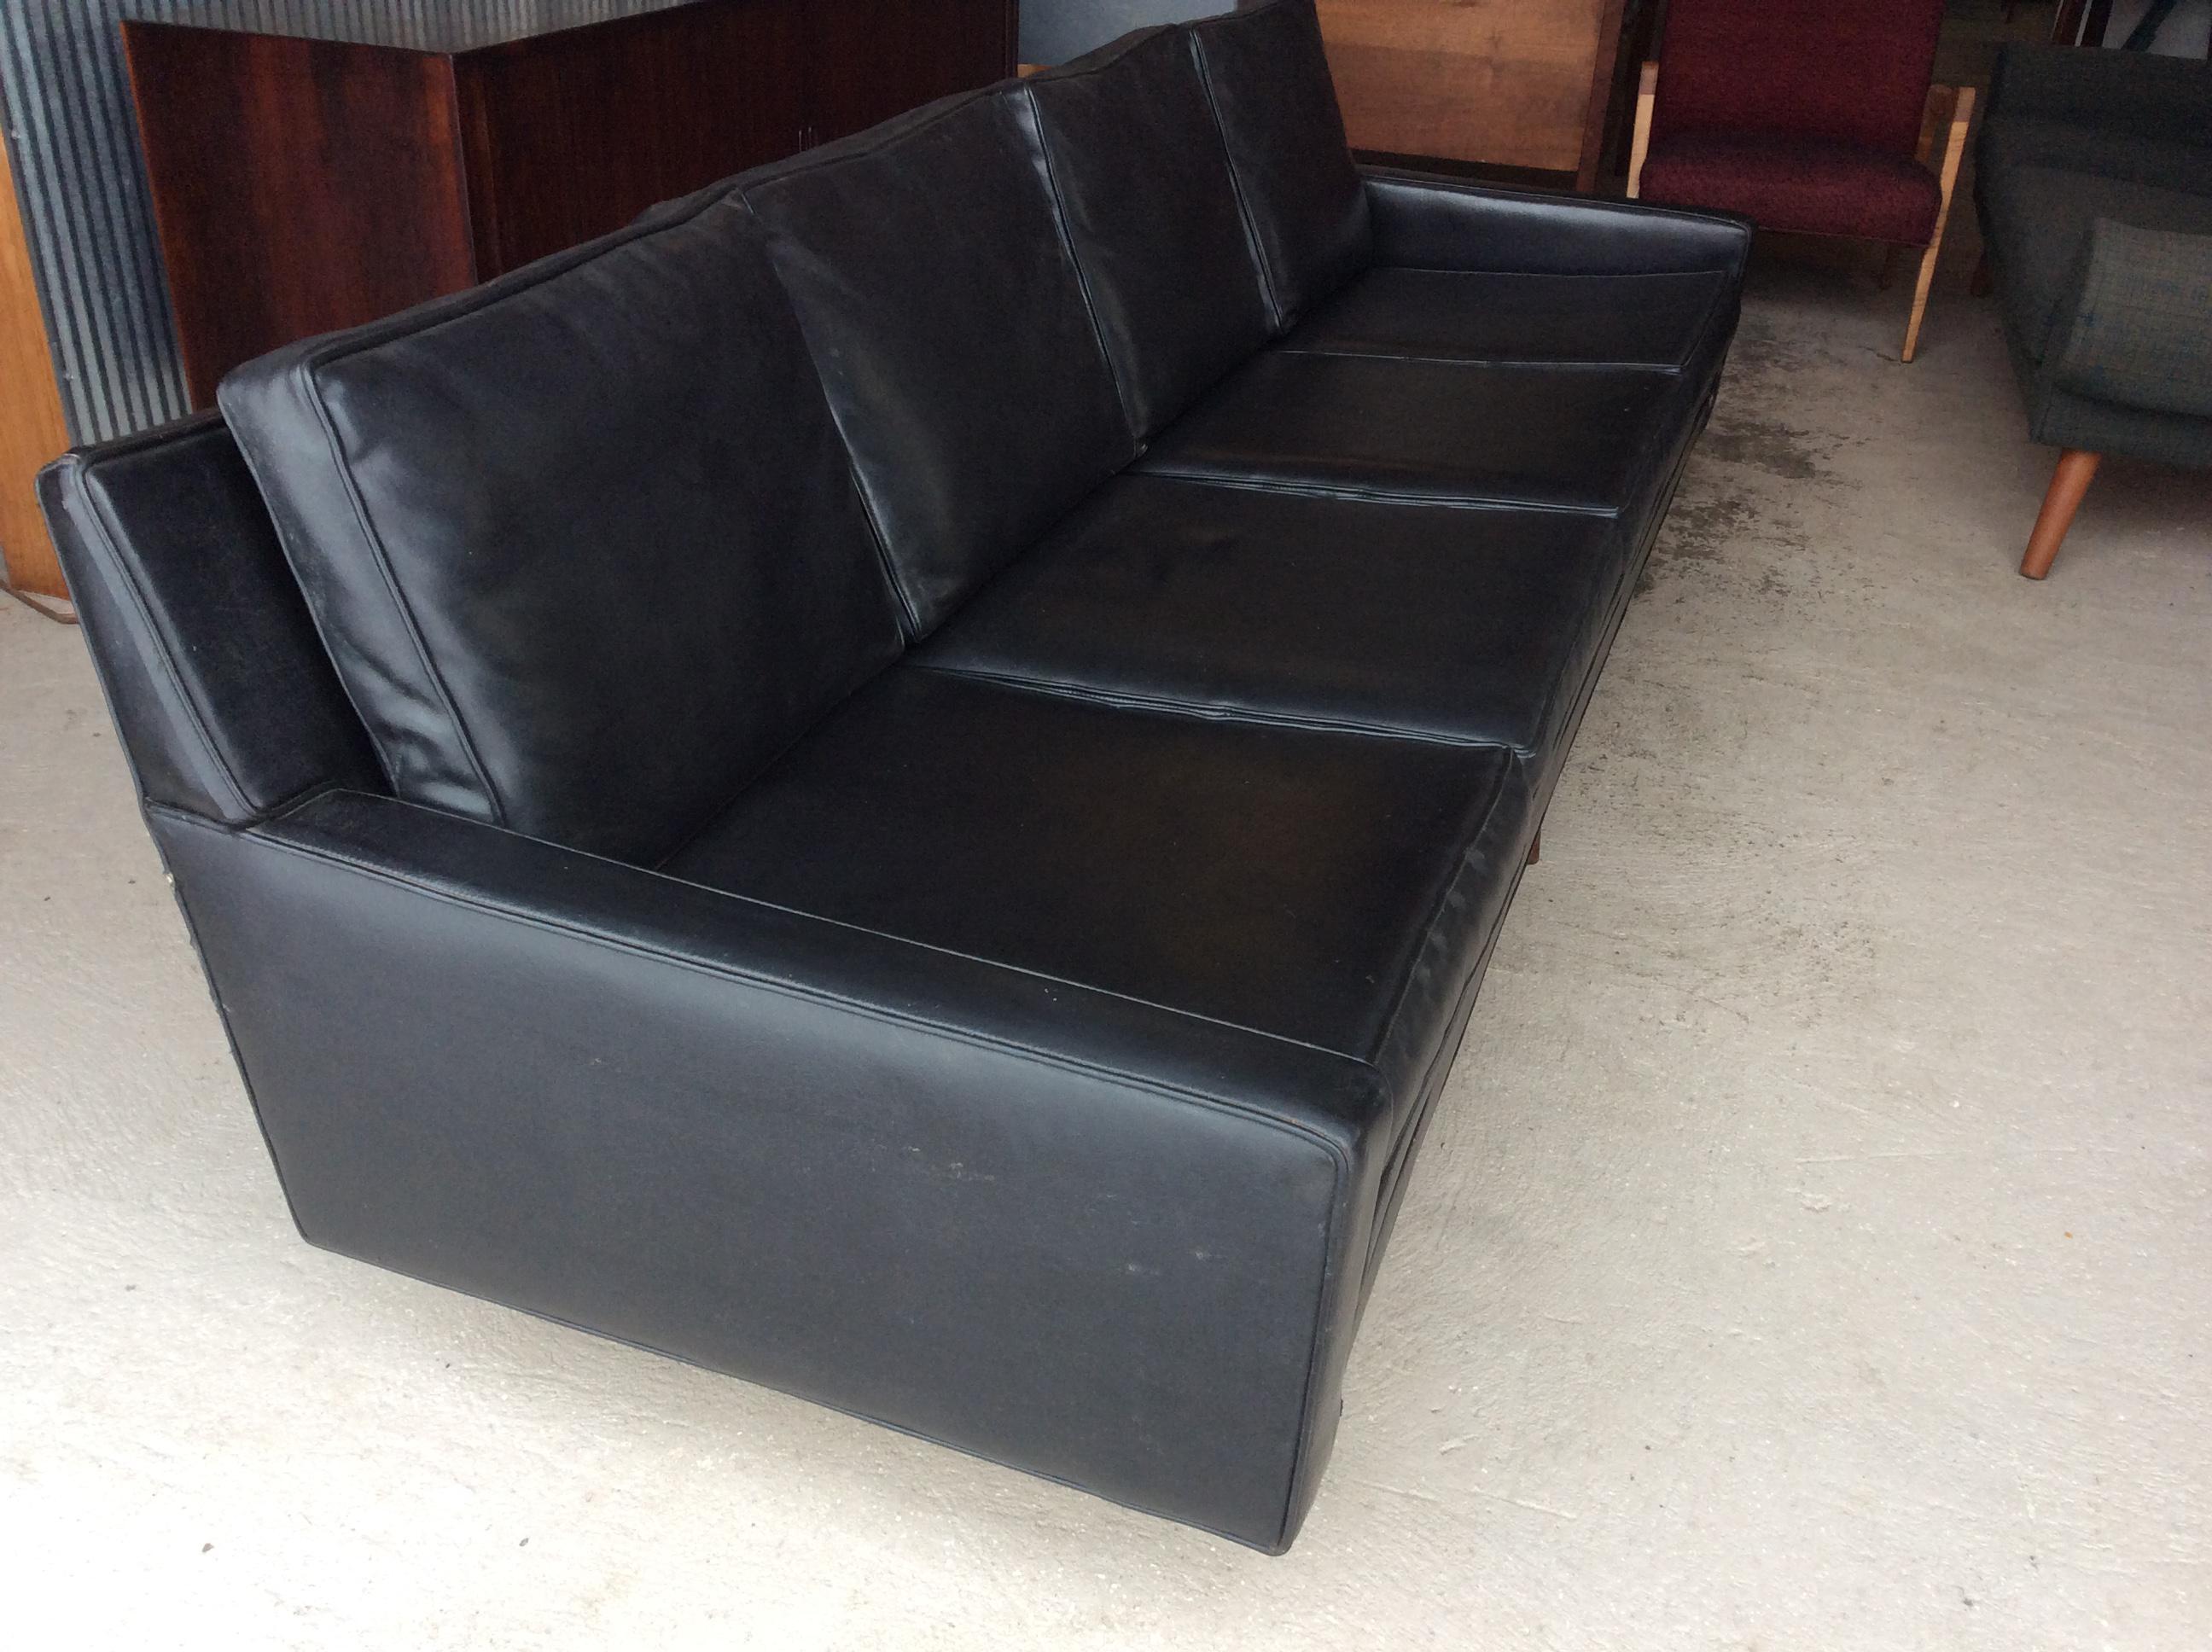 Milo Baughman For Thayer Coggin Black Vinyl Sofa With Walnut Legs. Sofa Is  In Good